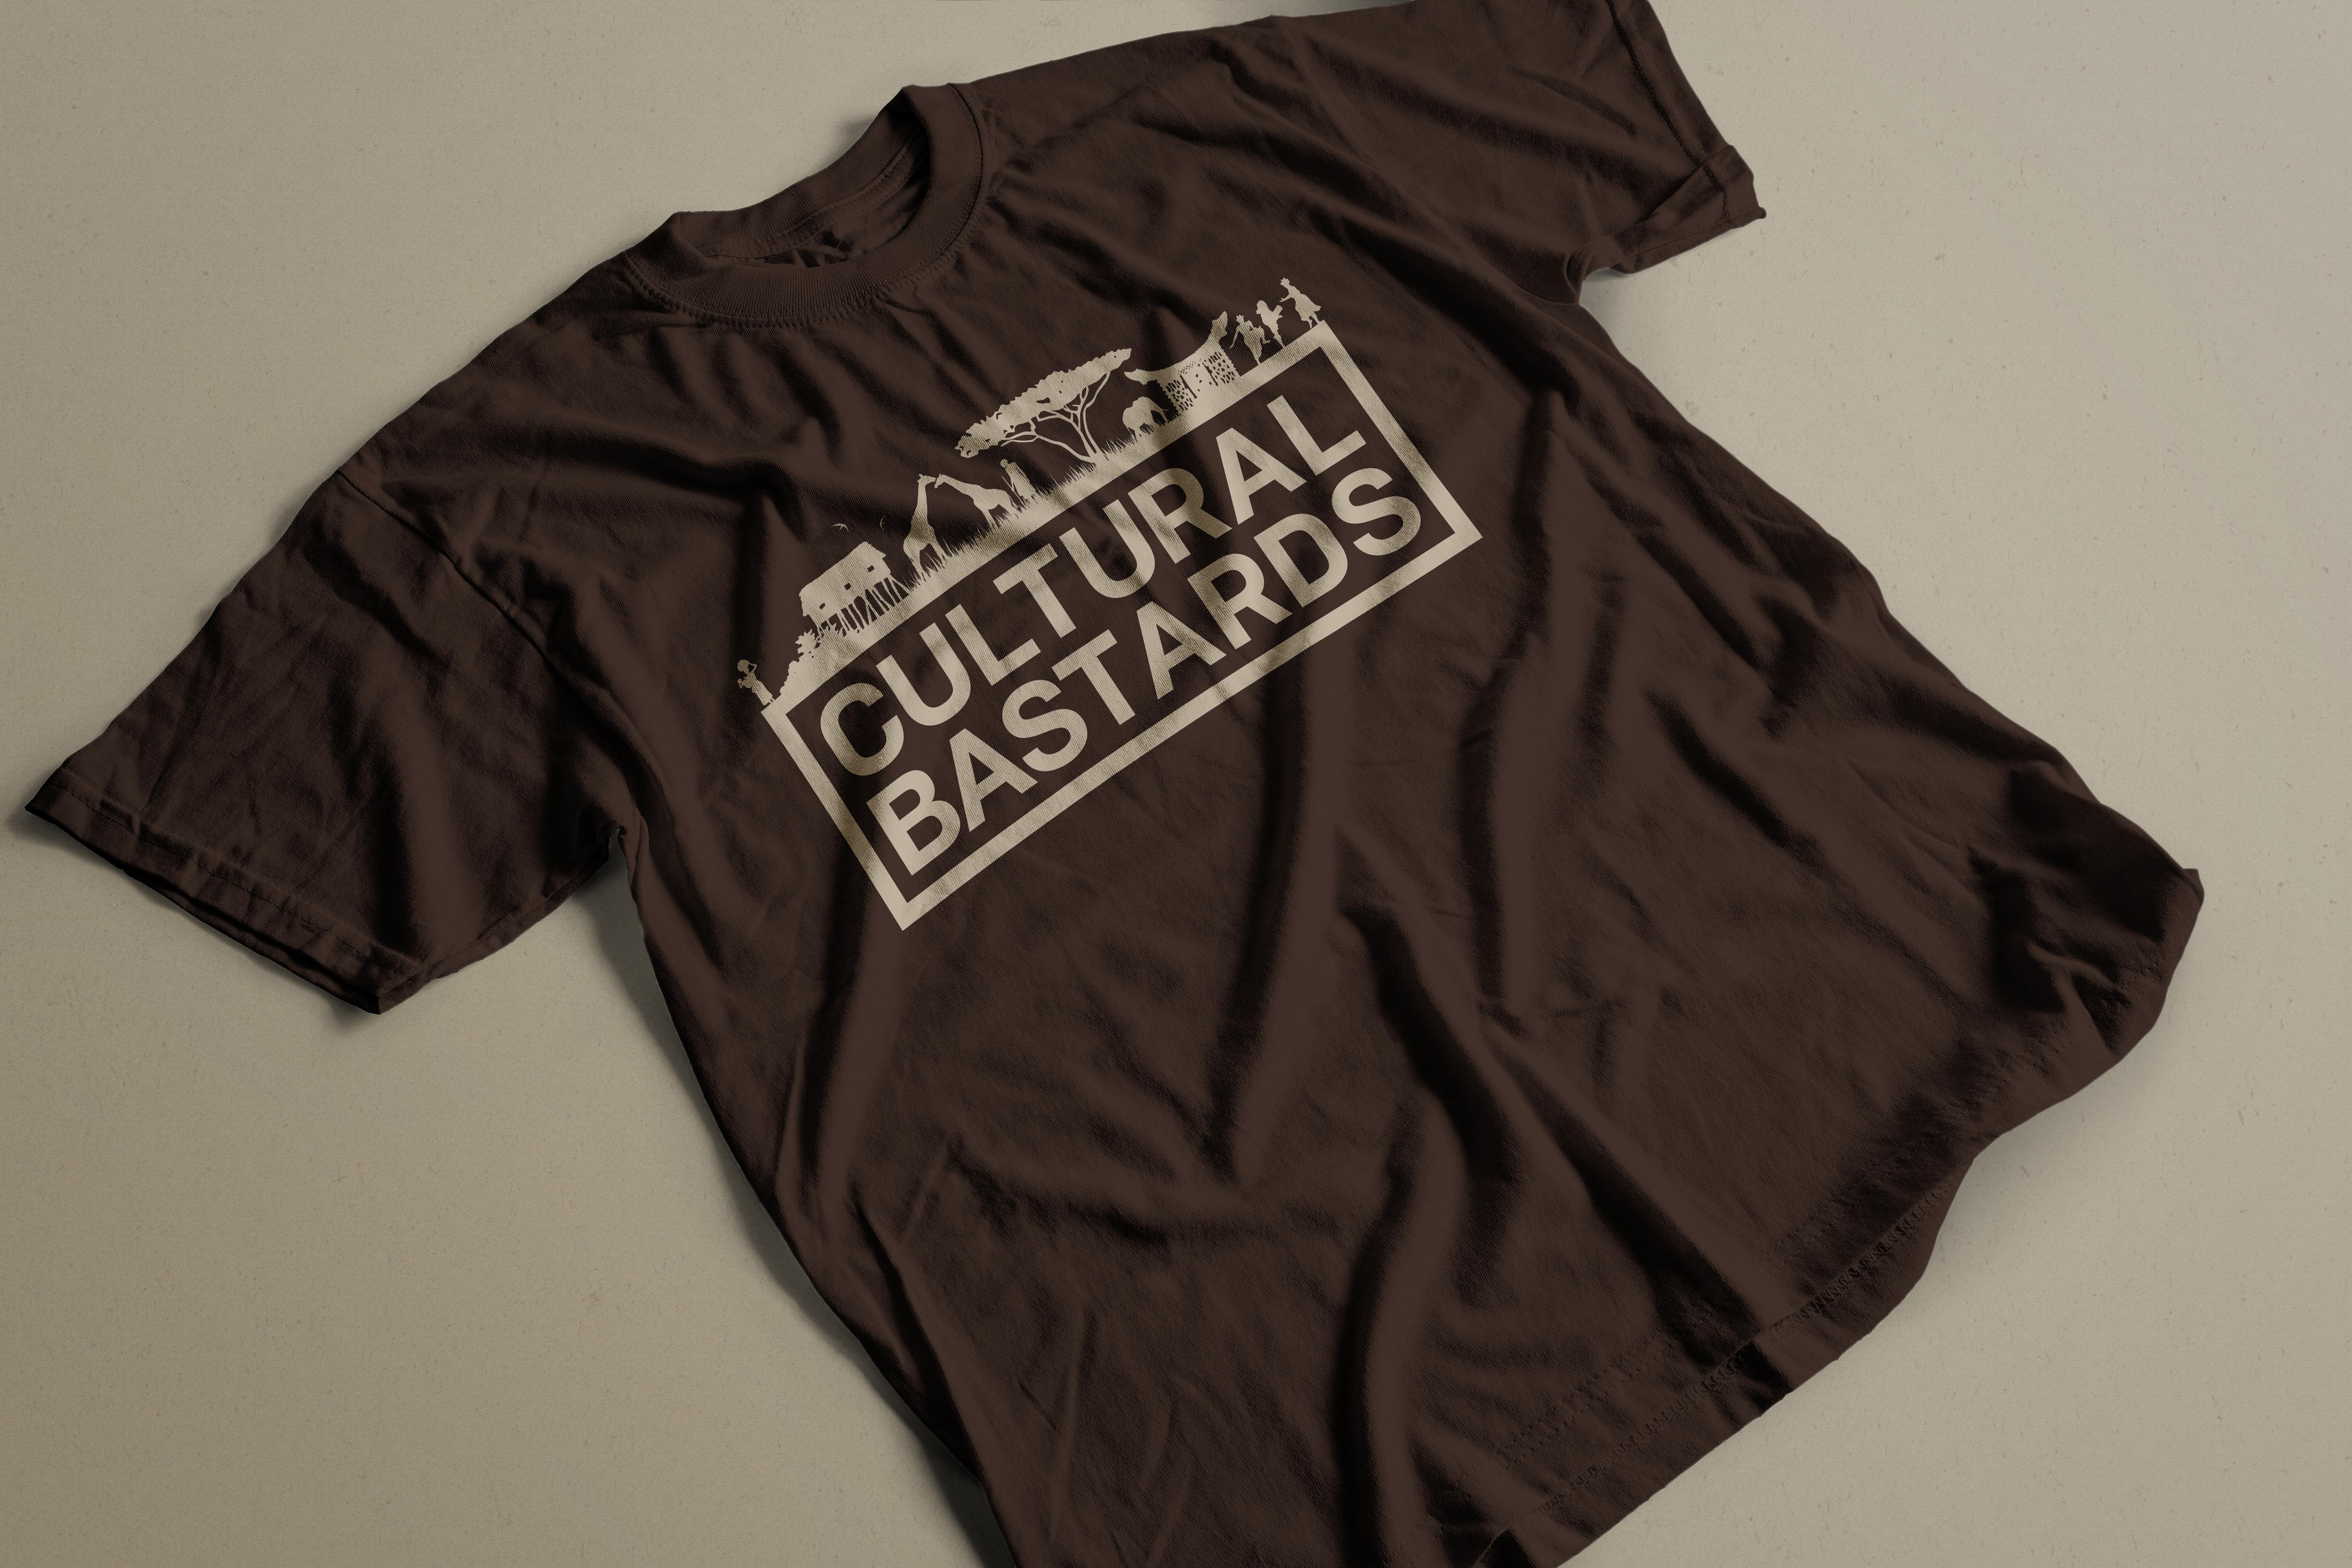 Cultural Bastards Africa T-Shirt